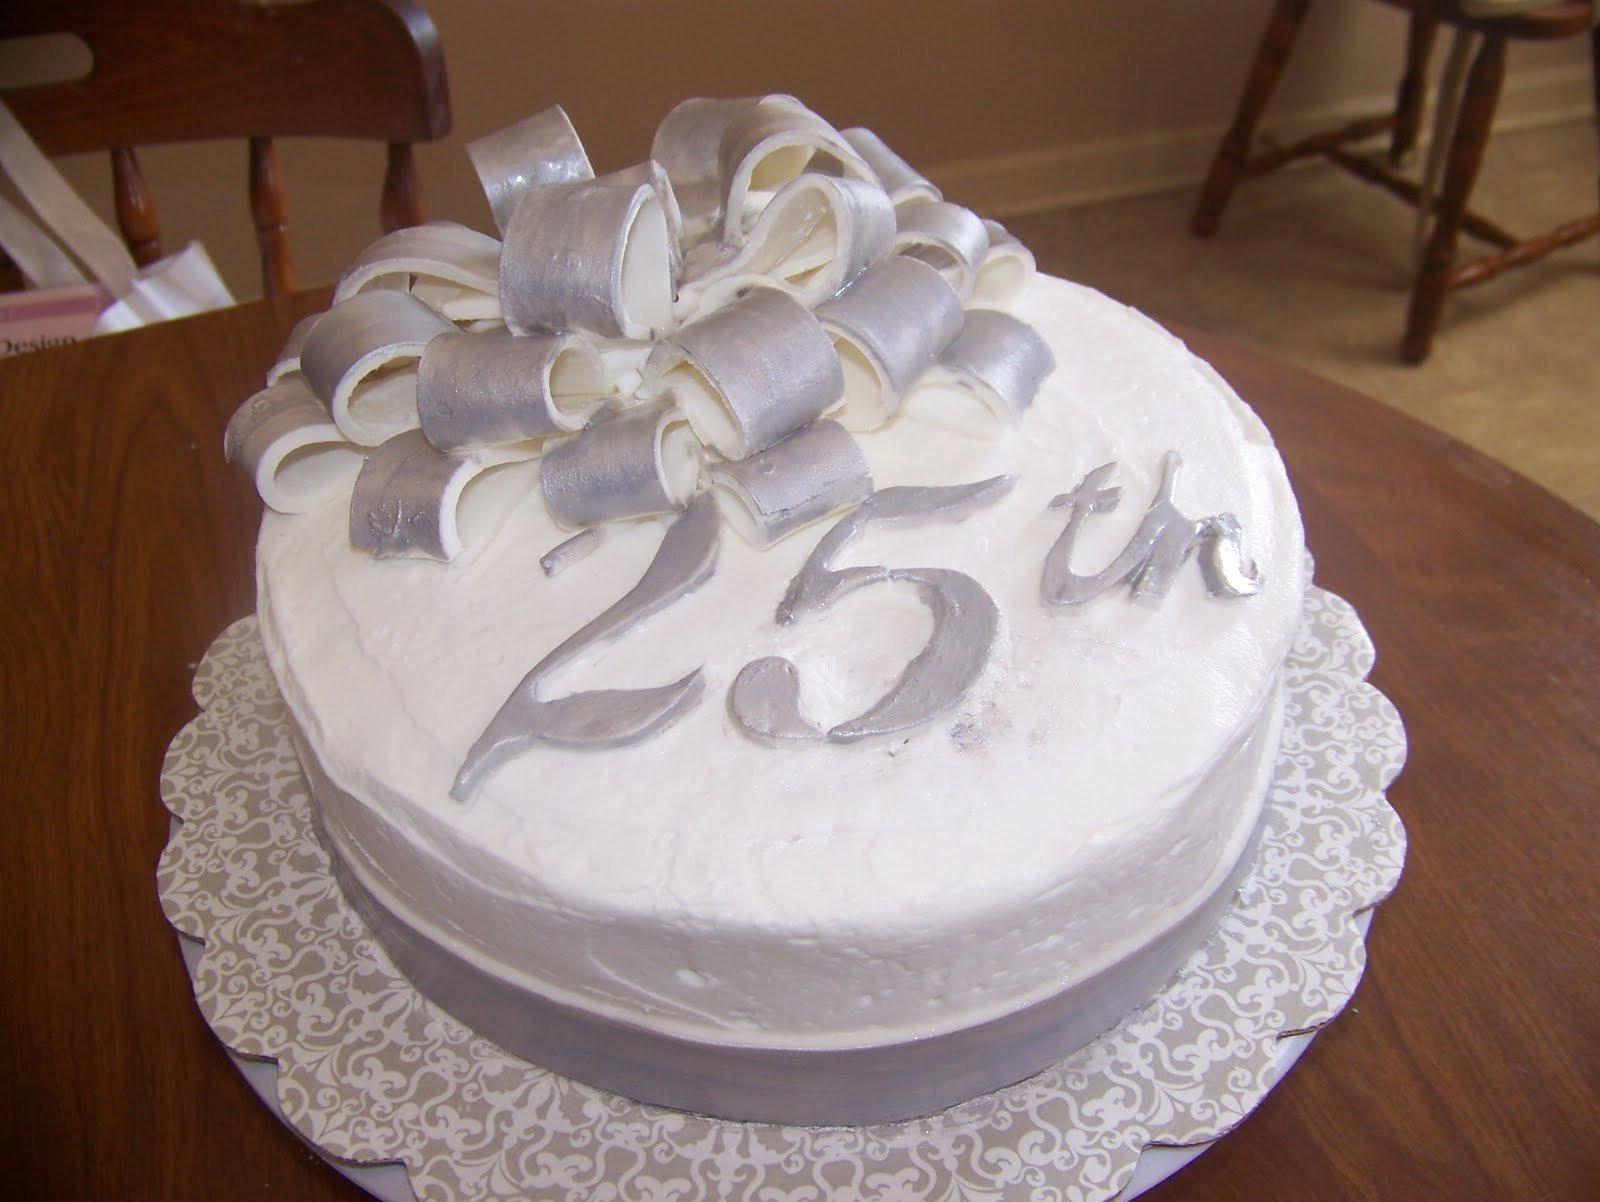 10 Wonderful 25 Wedding Anniversary Party Ideas how to throw a memorable 25th wedding anniversary party venuelook blog 1 2020